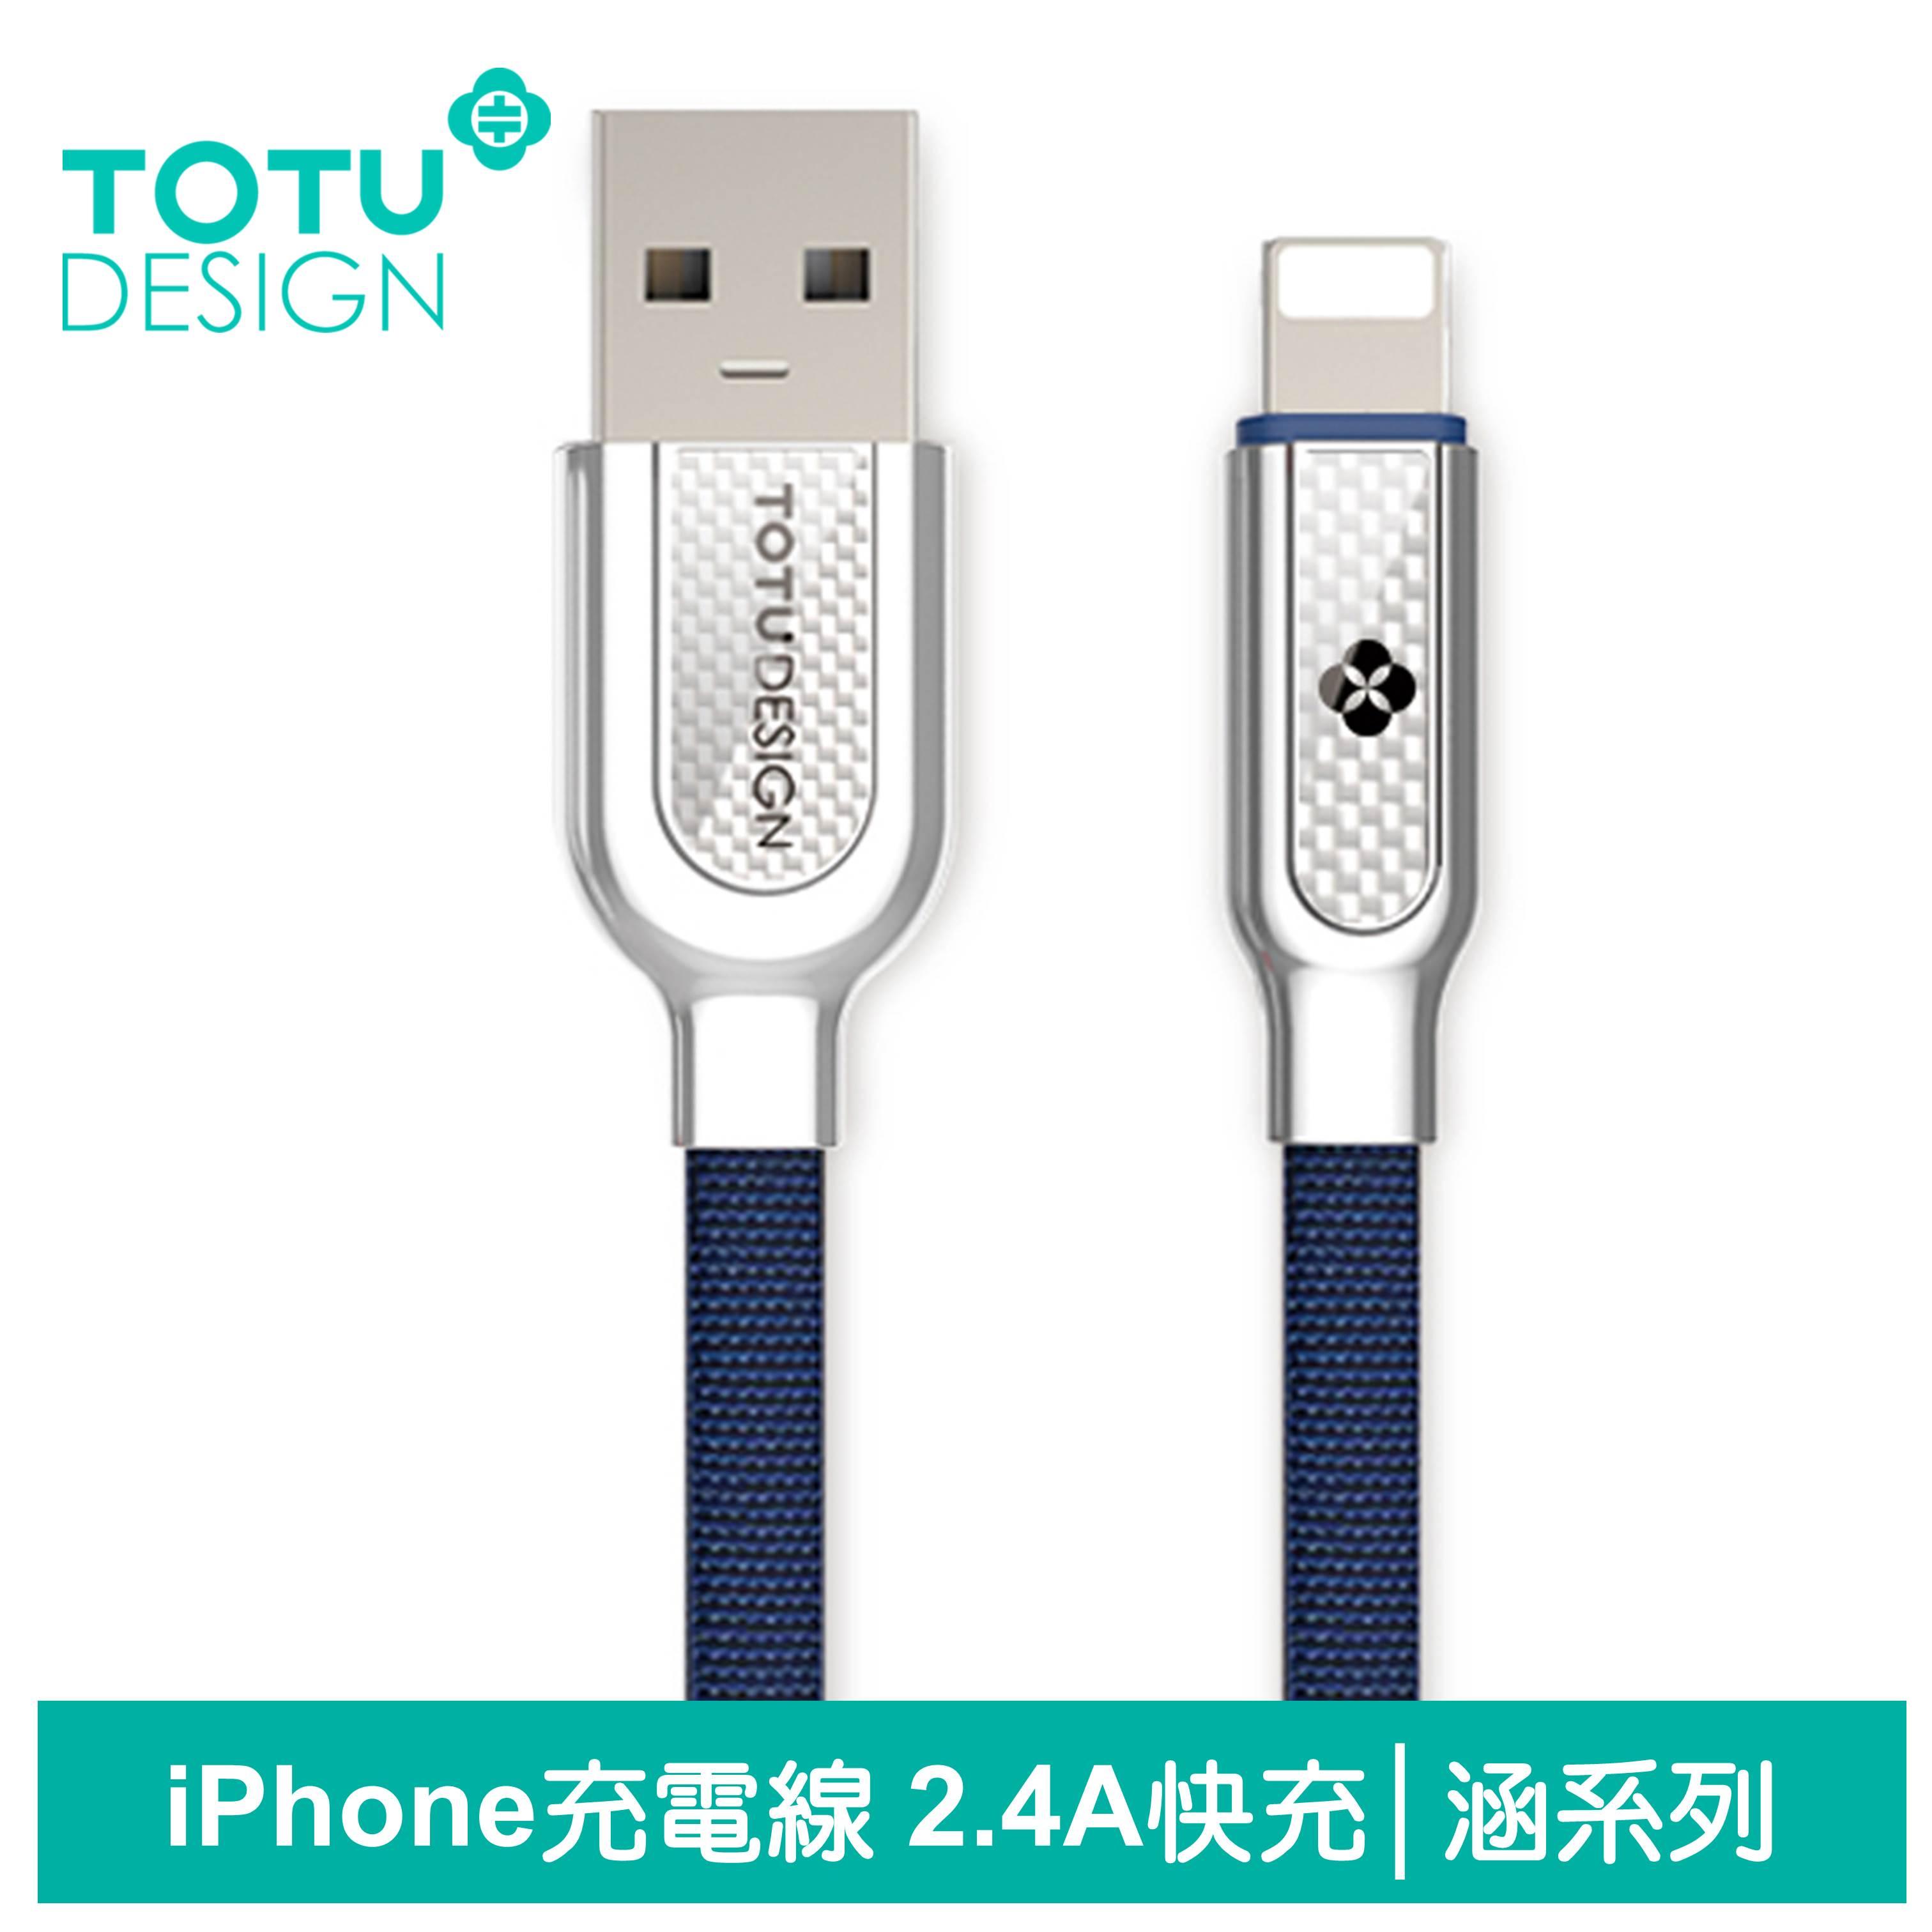 TOTU台灣官方 iPhone/Lightning充電線傳輸線 鋅合金 2.4A快充 涵系列 120cm 藍色